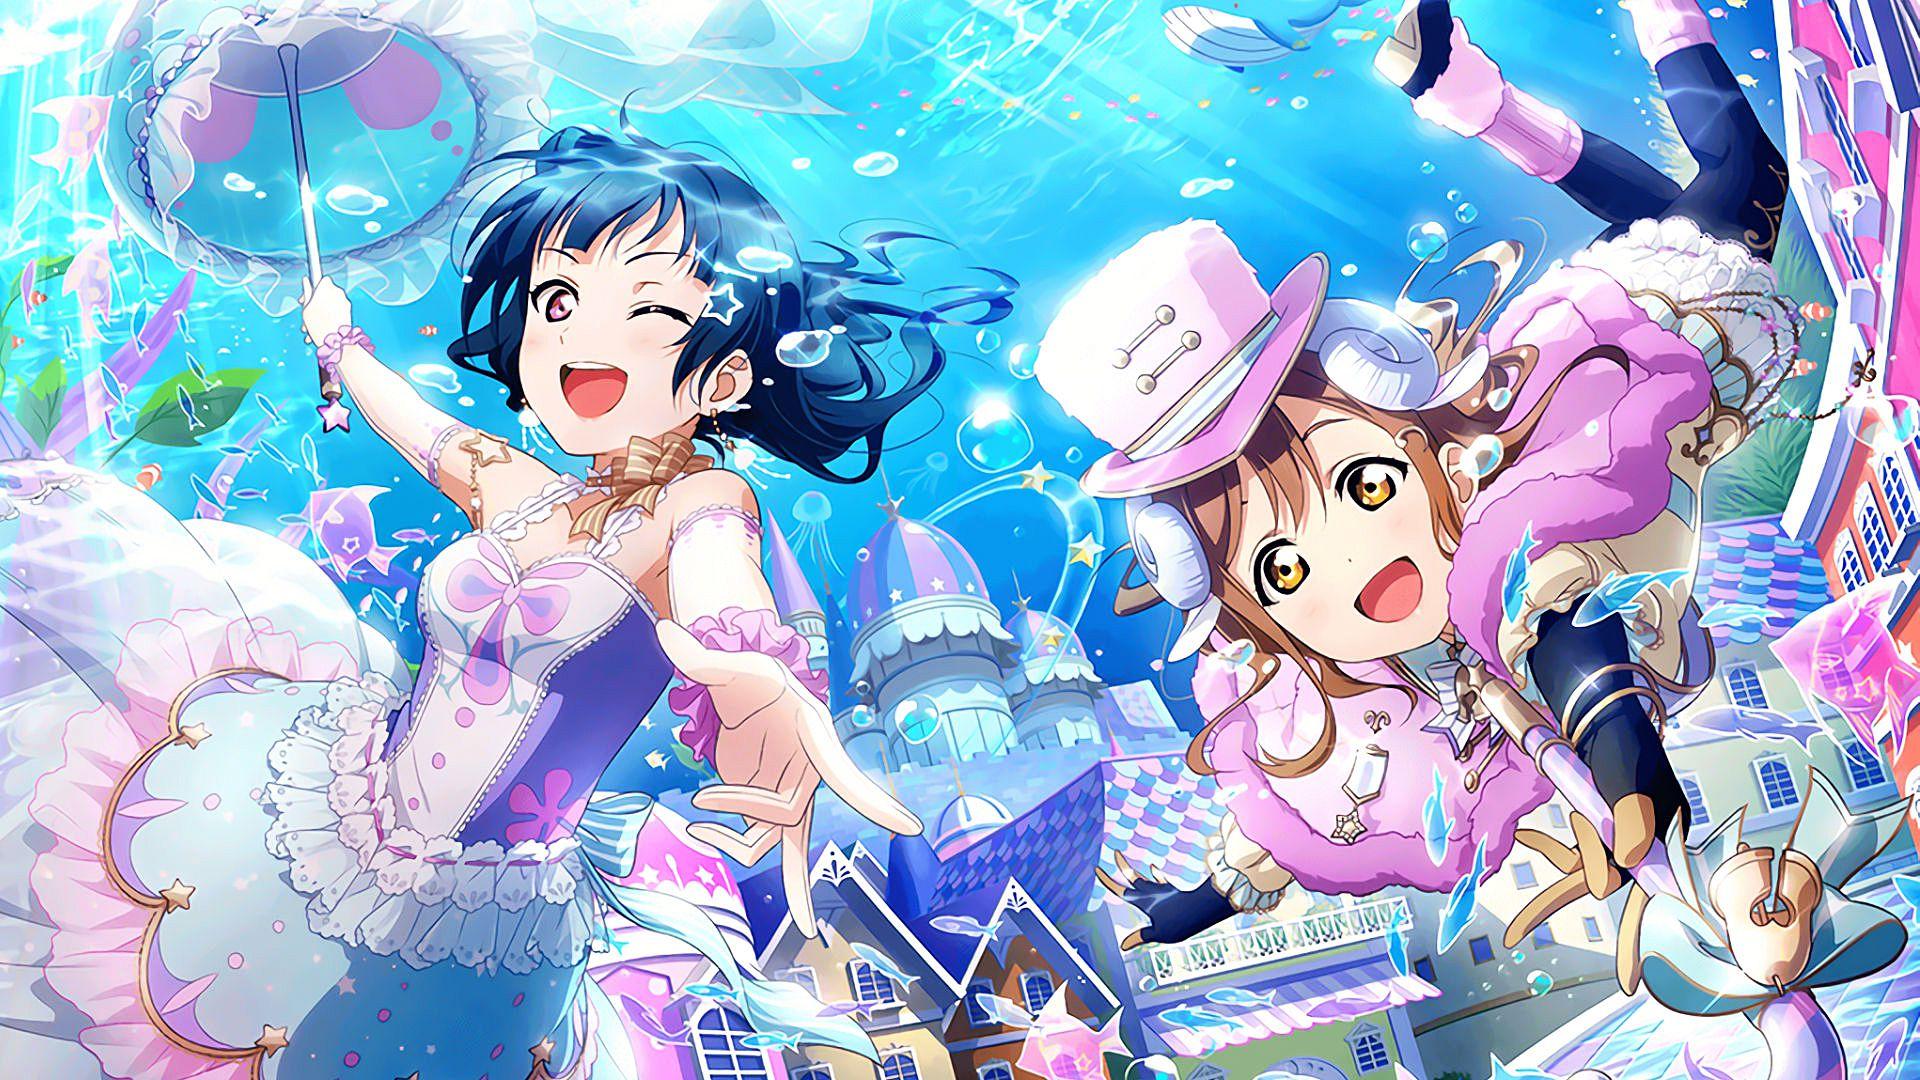 Love Live Wallpaper Hd New: アニメ壁紙ネット PC・Android・iPhone壁紙・画像